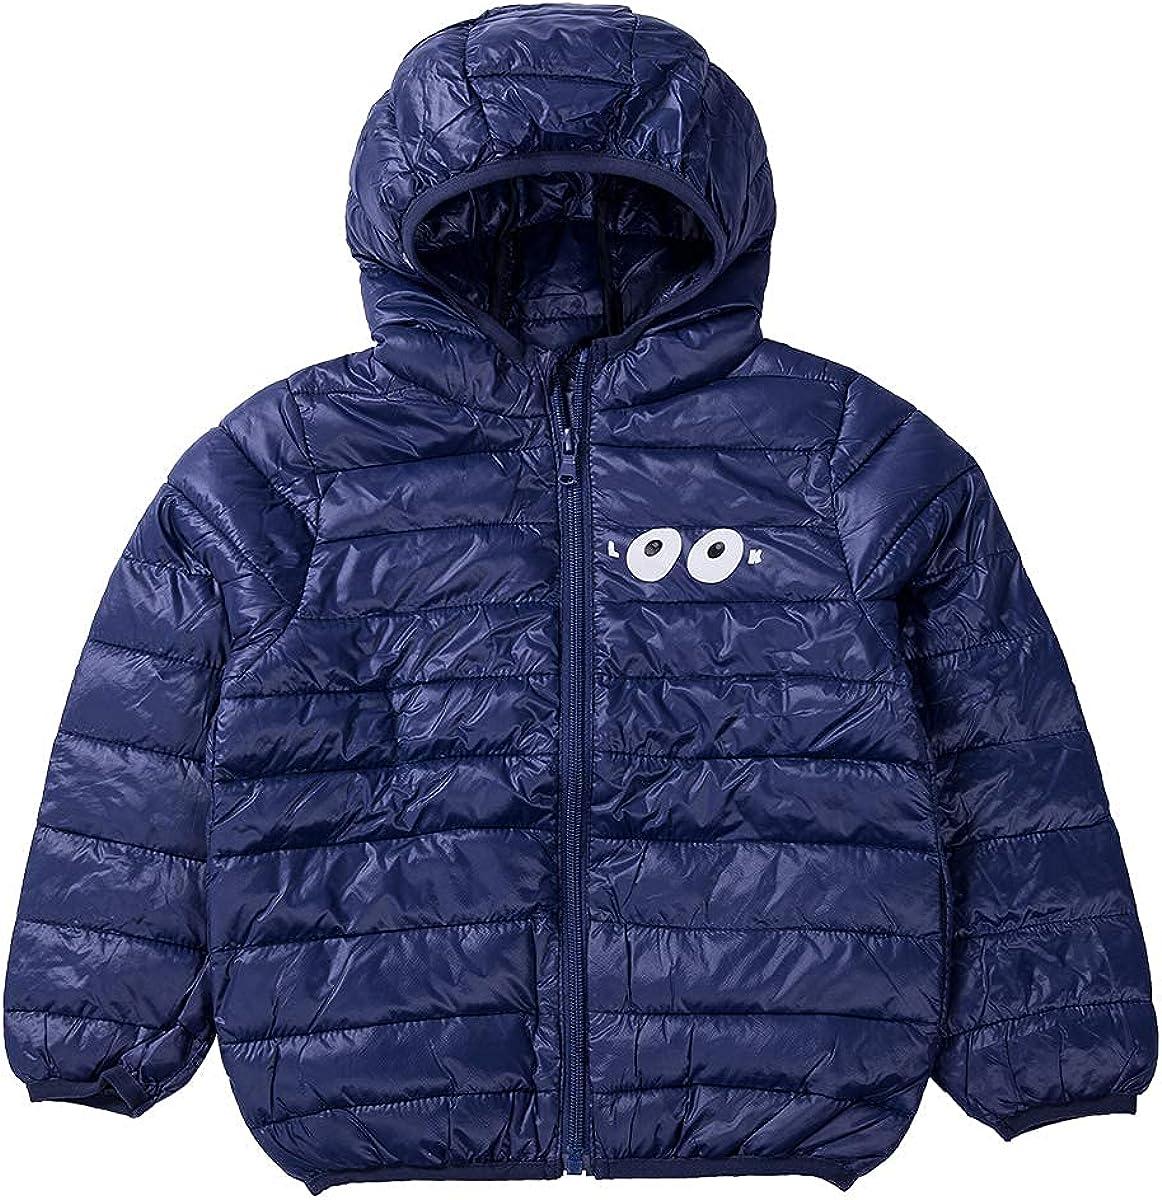 Dallas Mall Tababobyto Kids Max 83% OFF Boy Girl Hooded Coat L Color Solid Print Cartoon